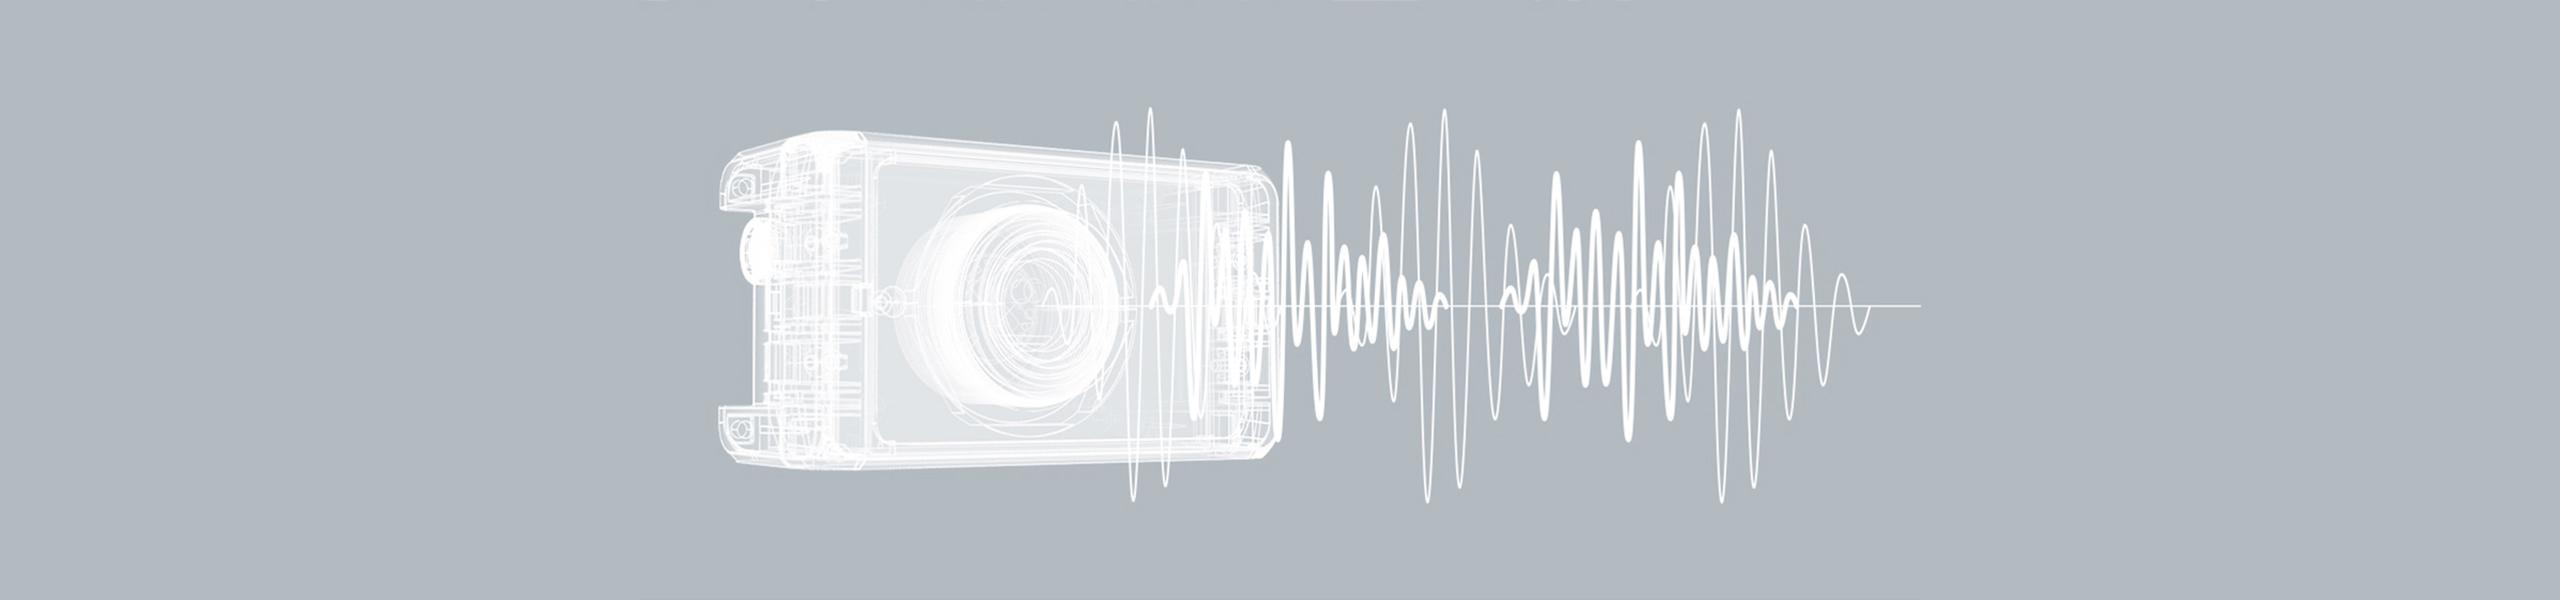 Day 3: Next Level of Ultrasonic Technology